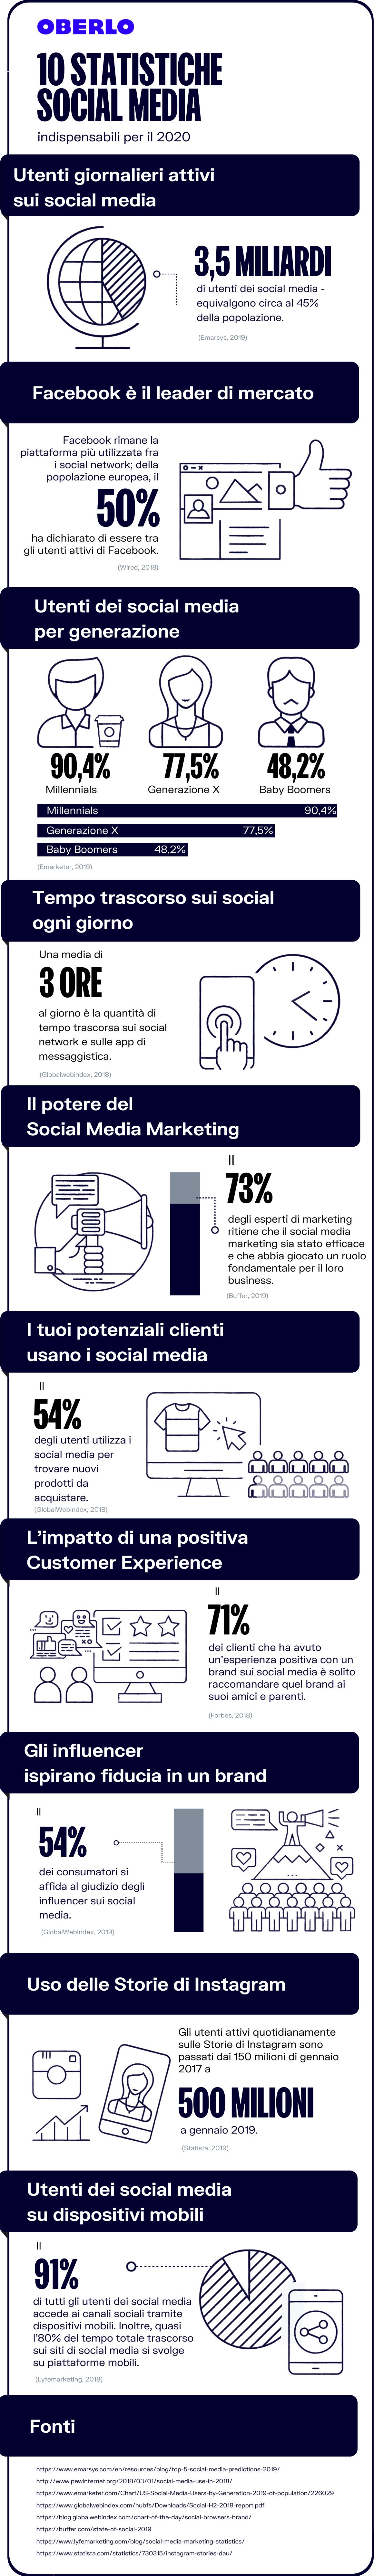 statistiche social media 2020